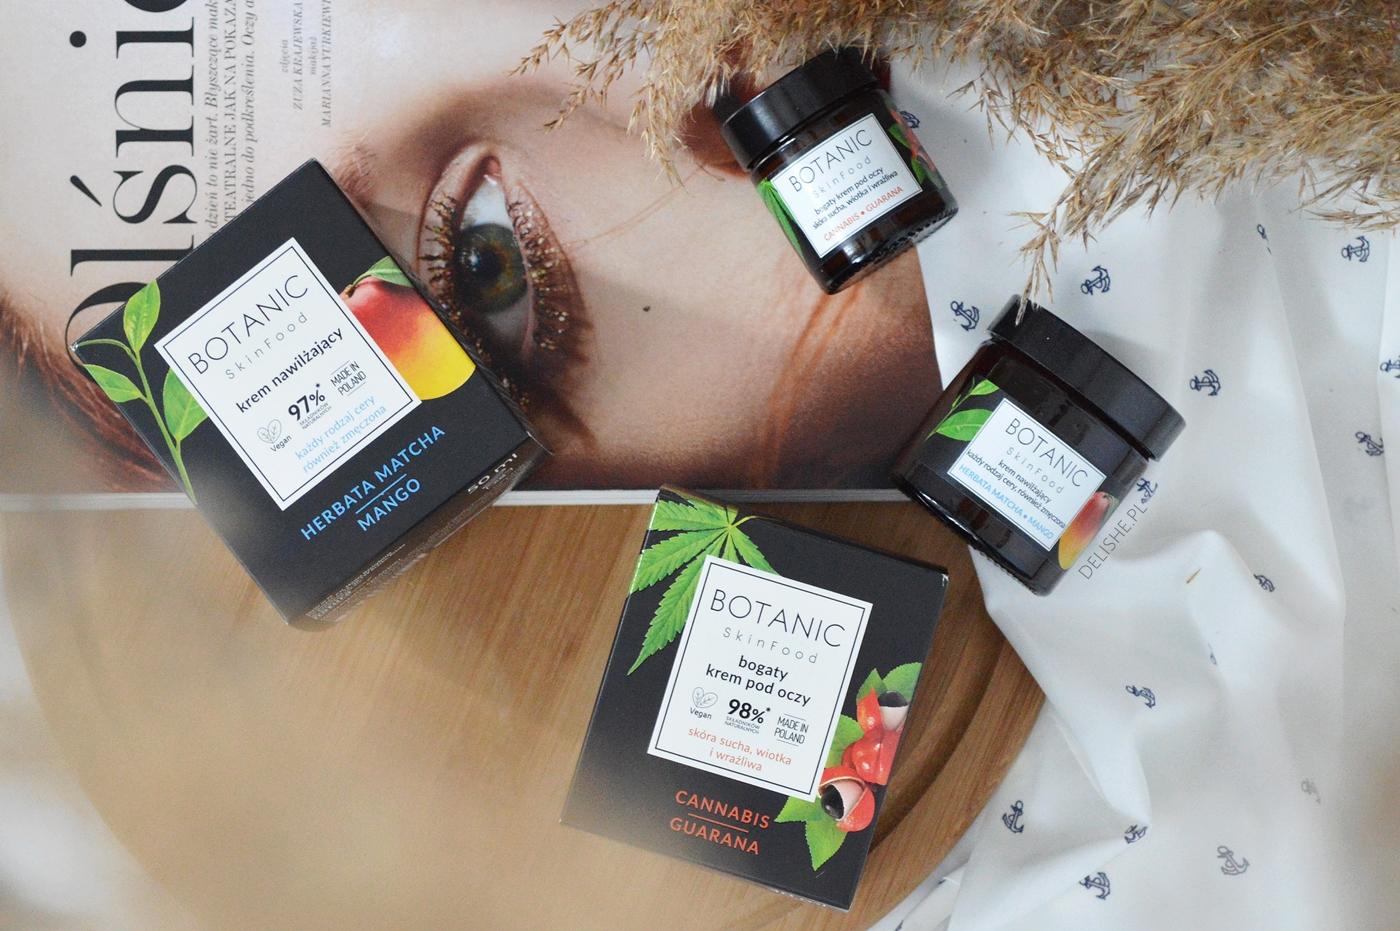 zakupy kosmetyczne blog botanic skinfood natura